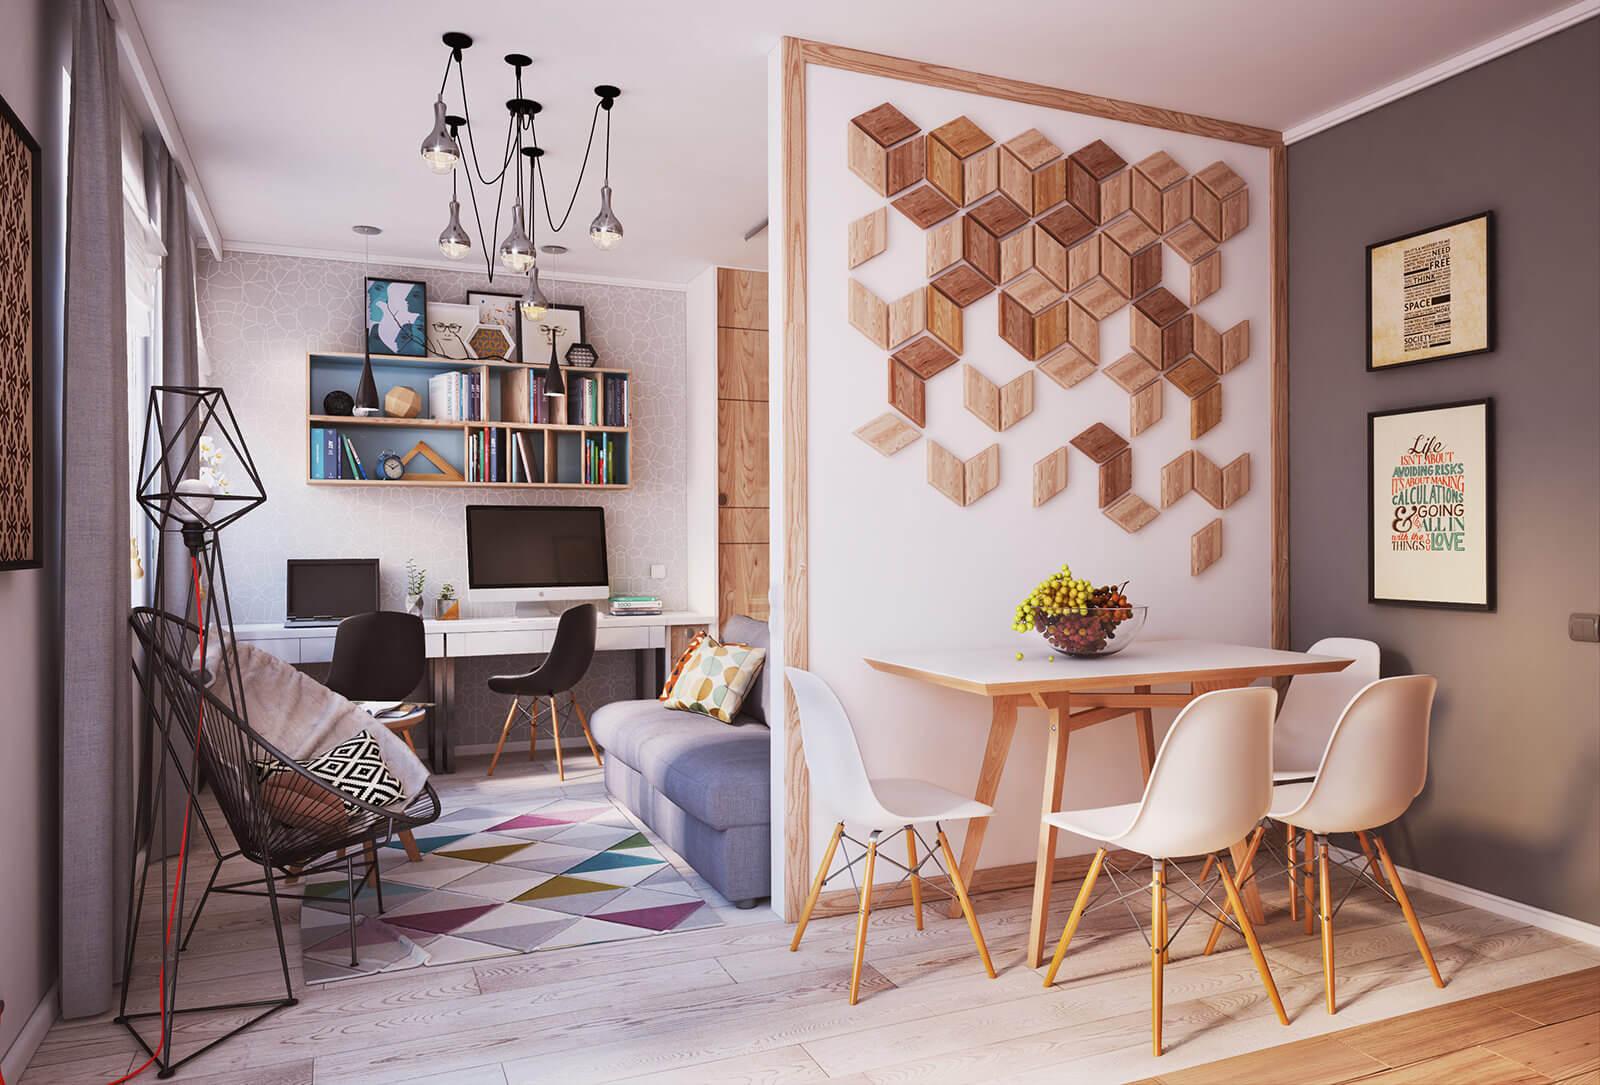 Красивый интерьер в квартире